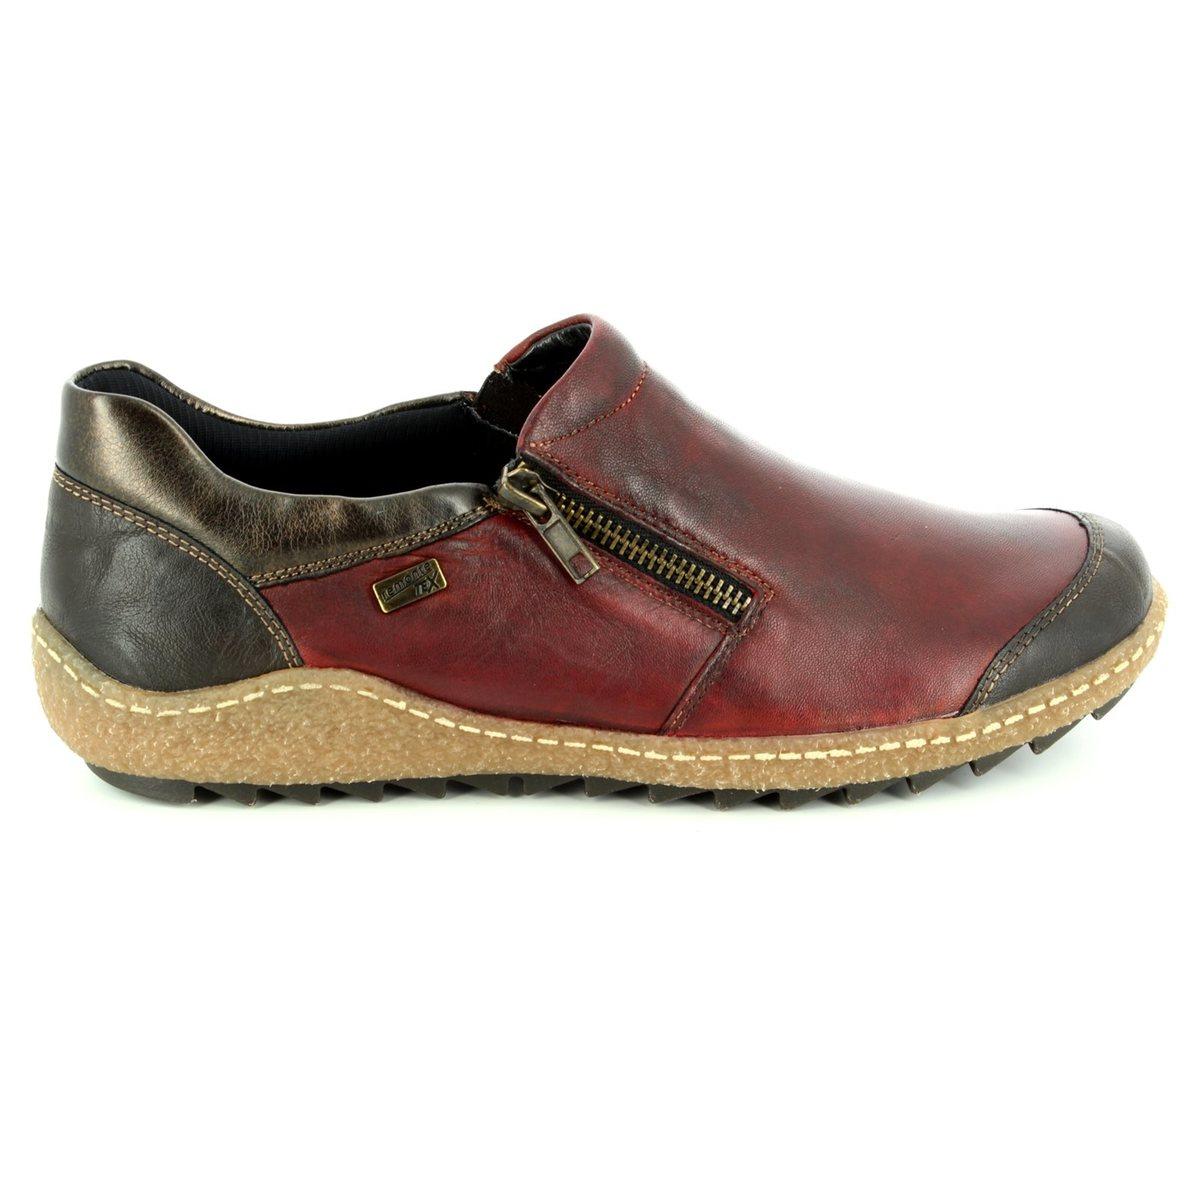 ecf6e78c Remonte Comfort Shoes - Red multi - R4701-35 ZIGSHU TEX